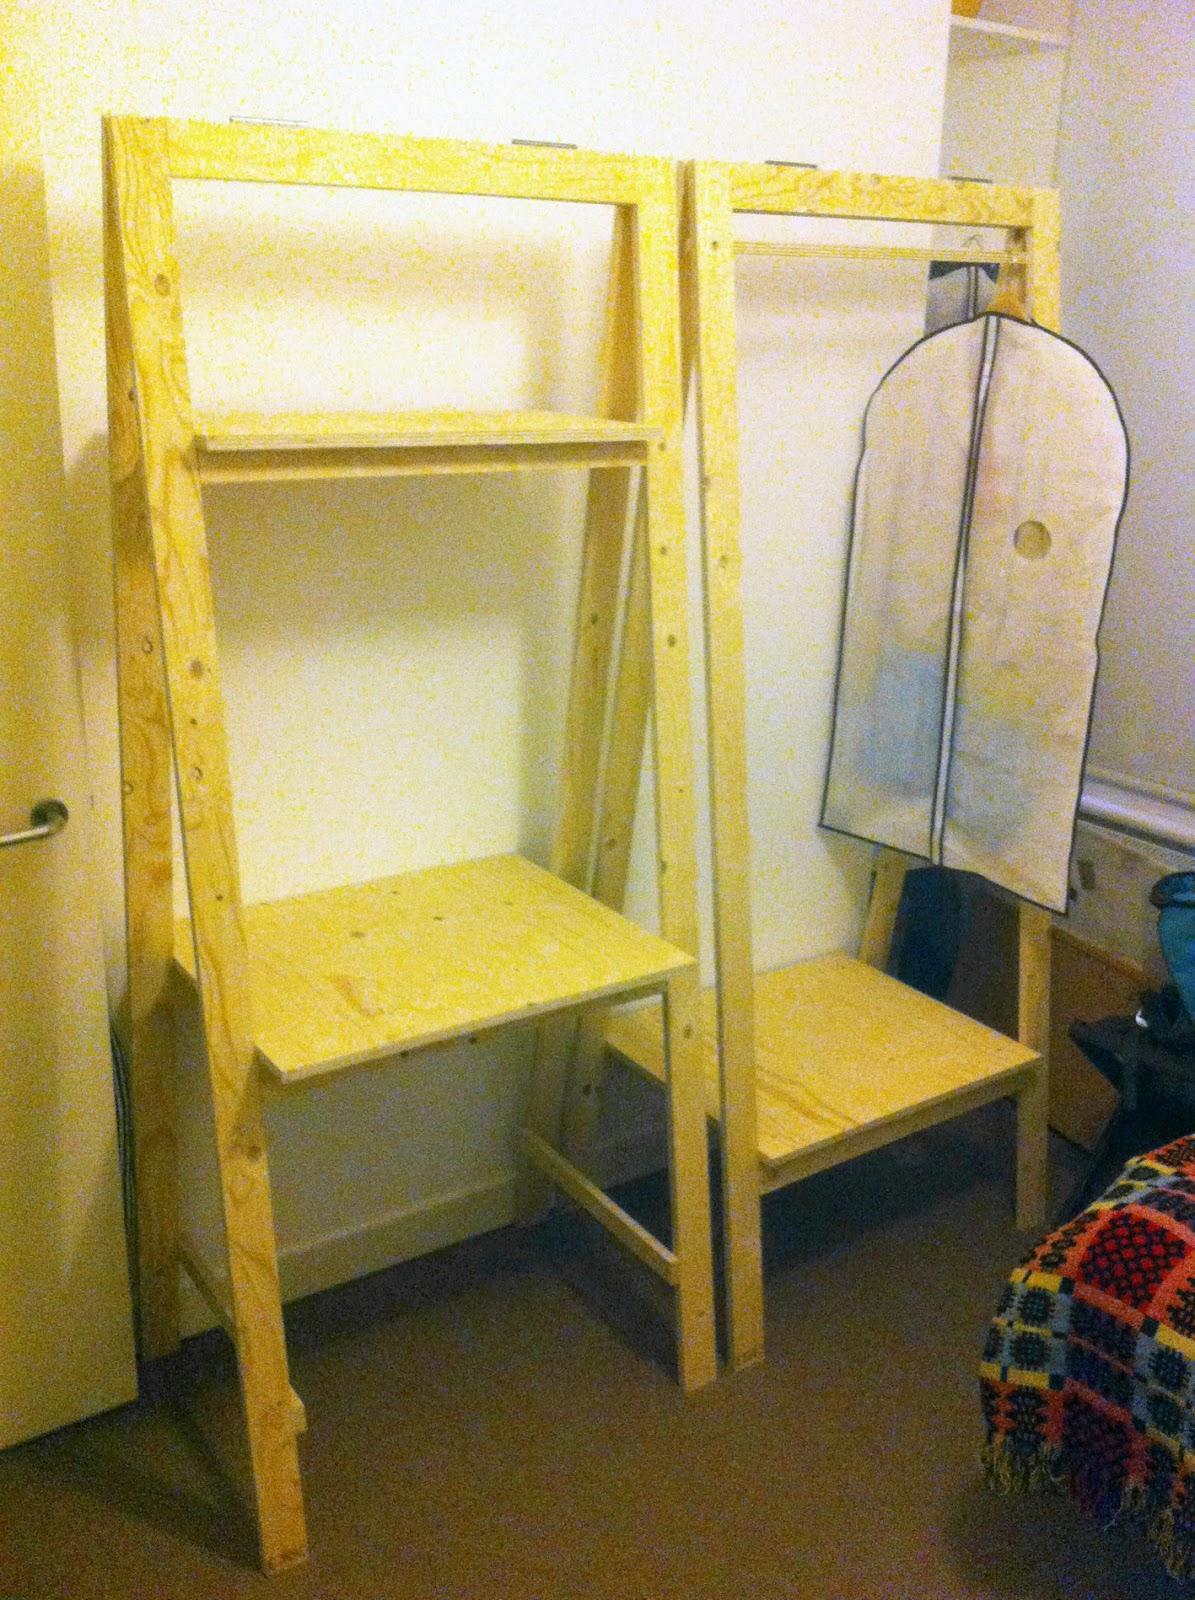 Jamesblaze Flat Pack Free Standing Bedroom Furniture